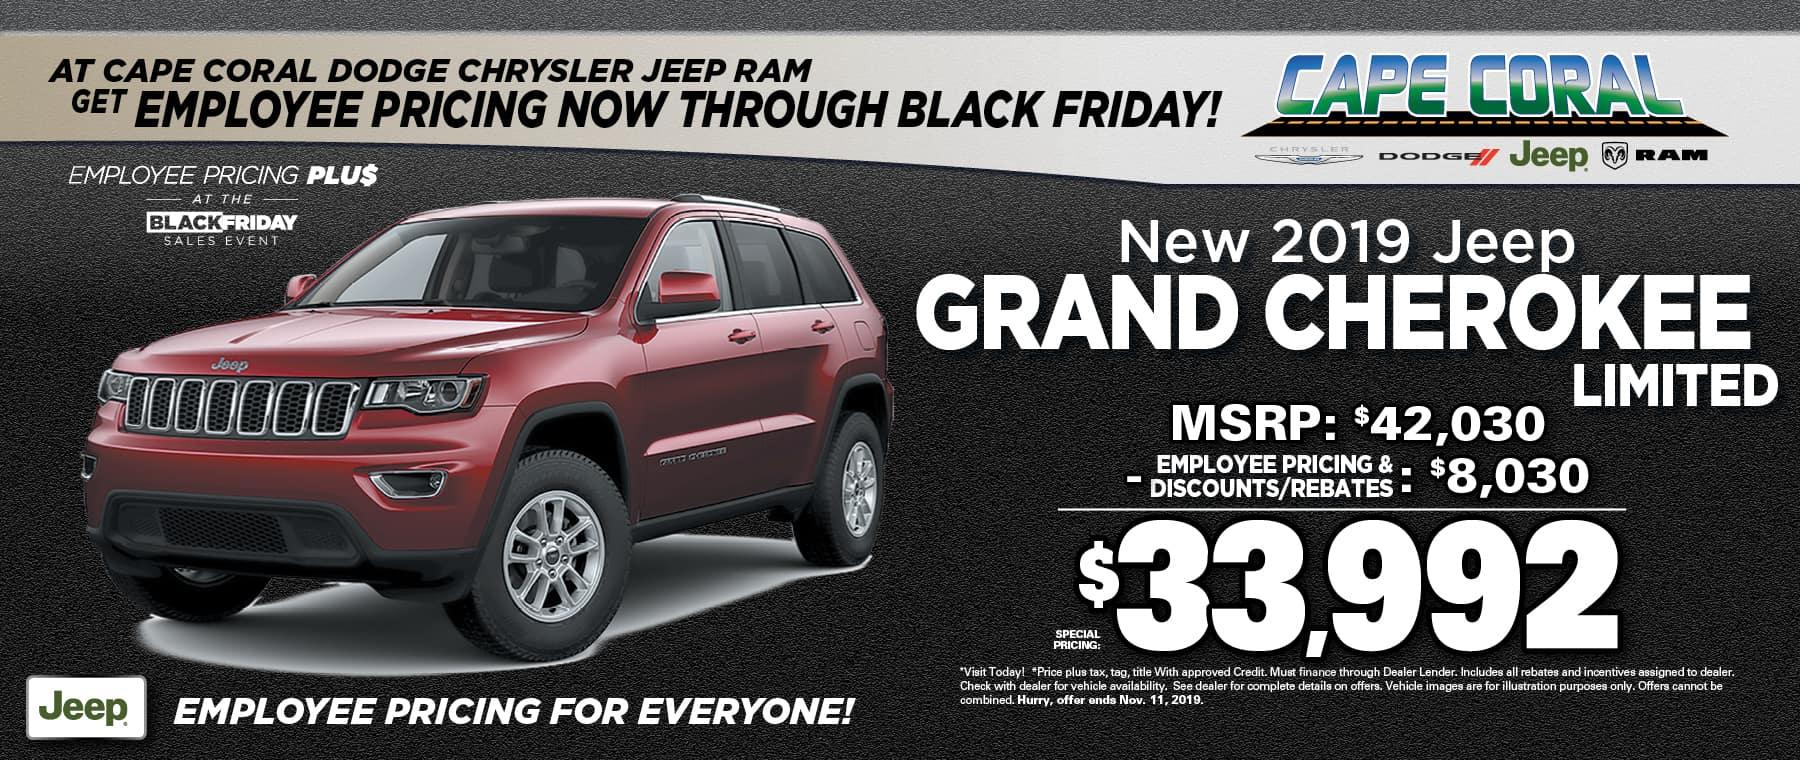 New 2019 Jeep Grand Cherokees!